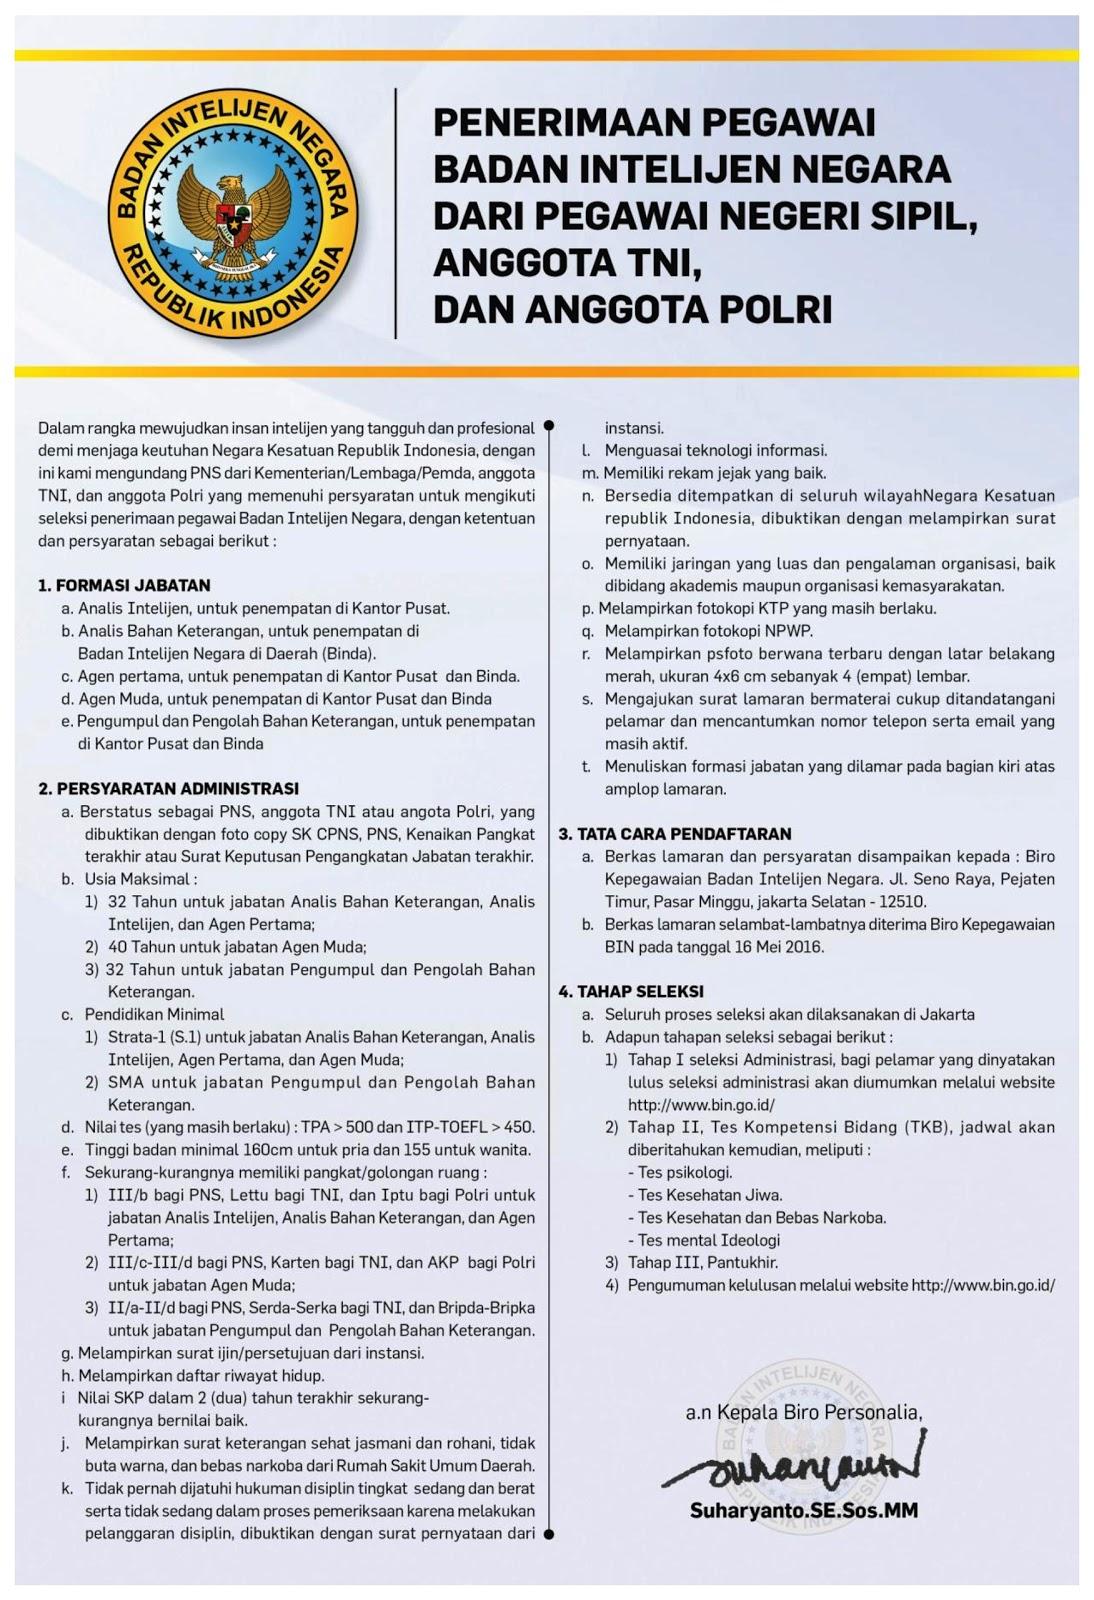 Penerimaan Pegawai Badan Inteligen Negara Tahun 2016